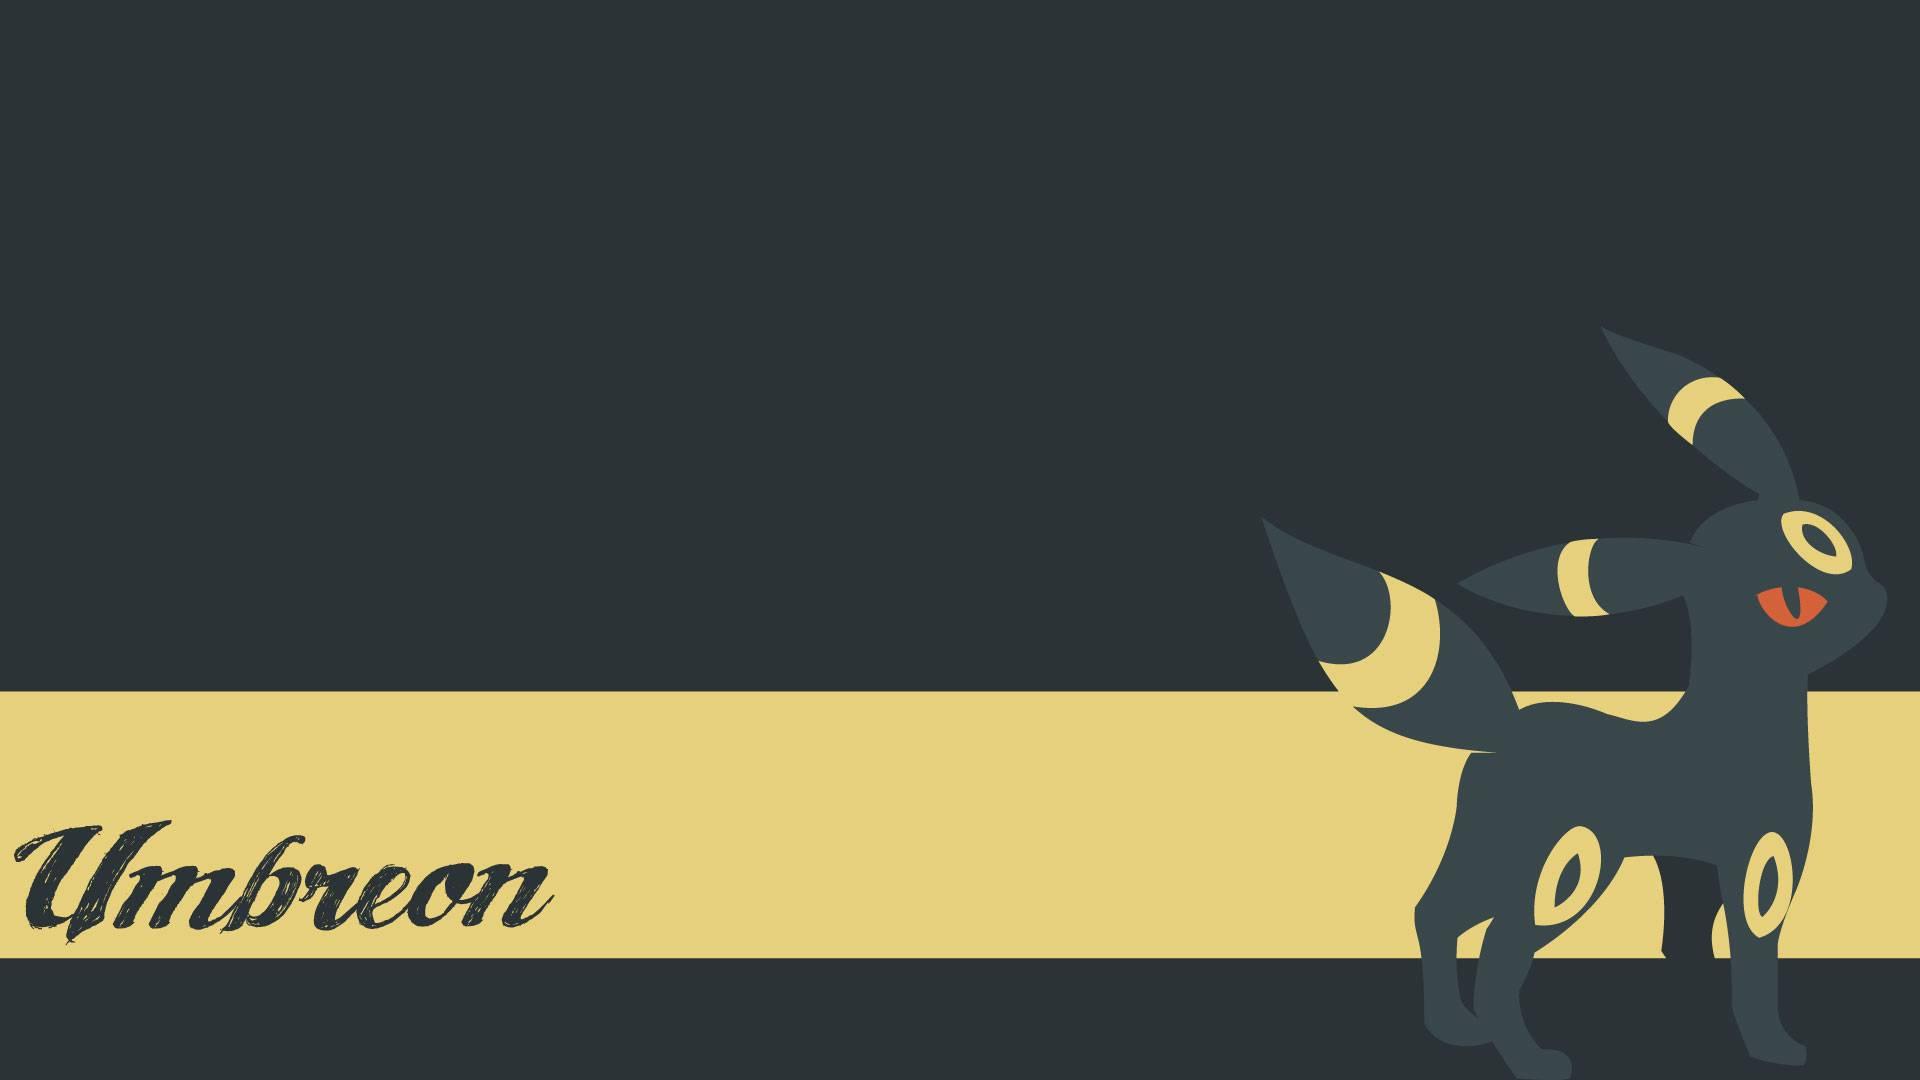 Umbreon   Pokemon Wallpaper 1920x1080